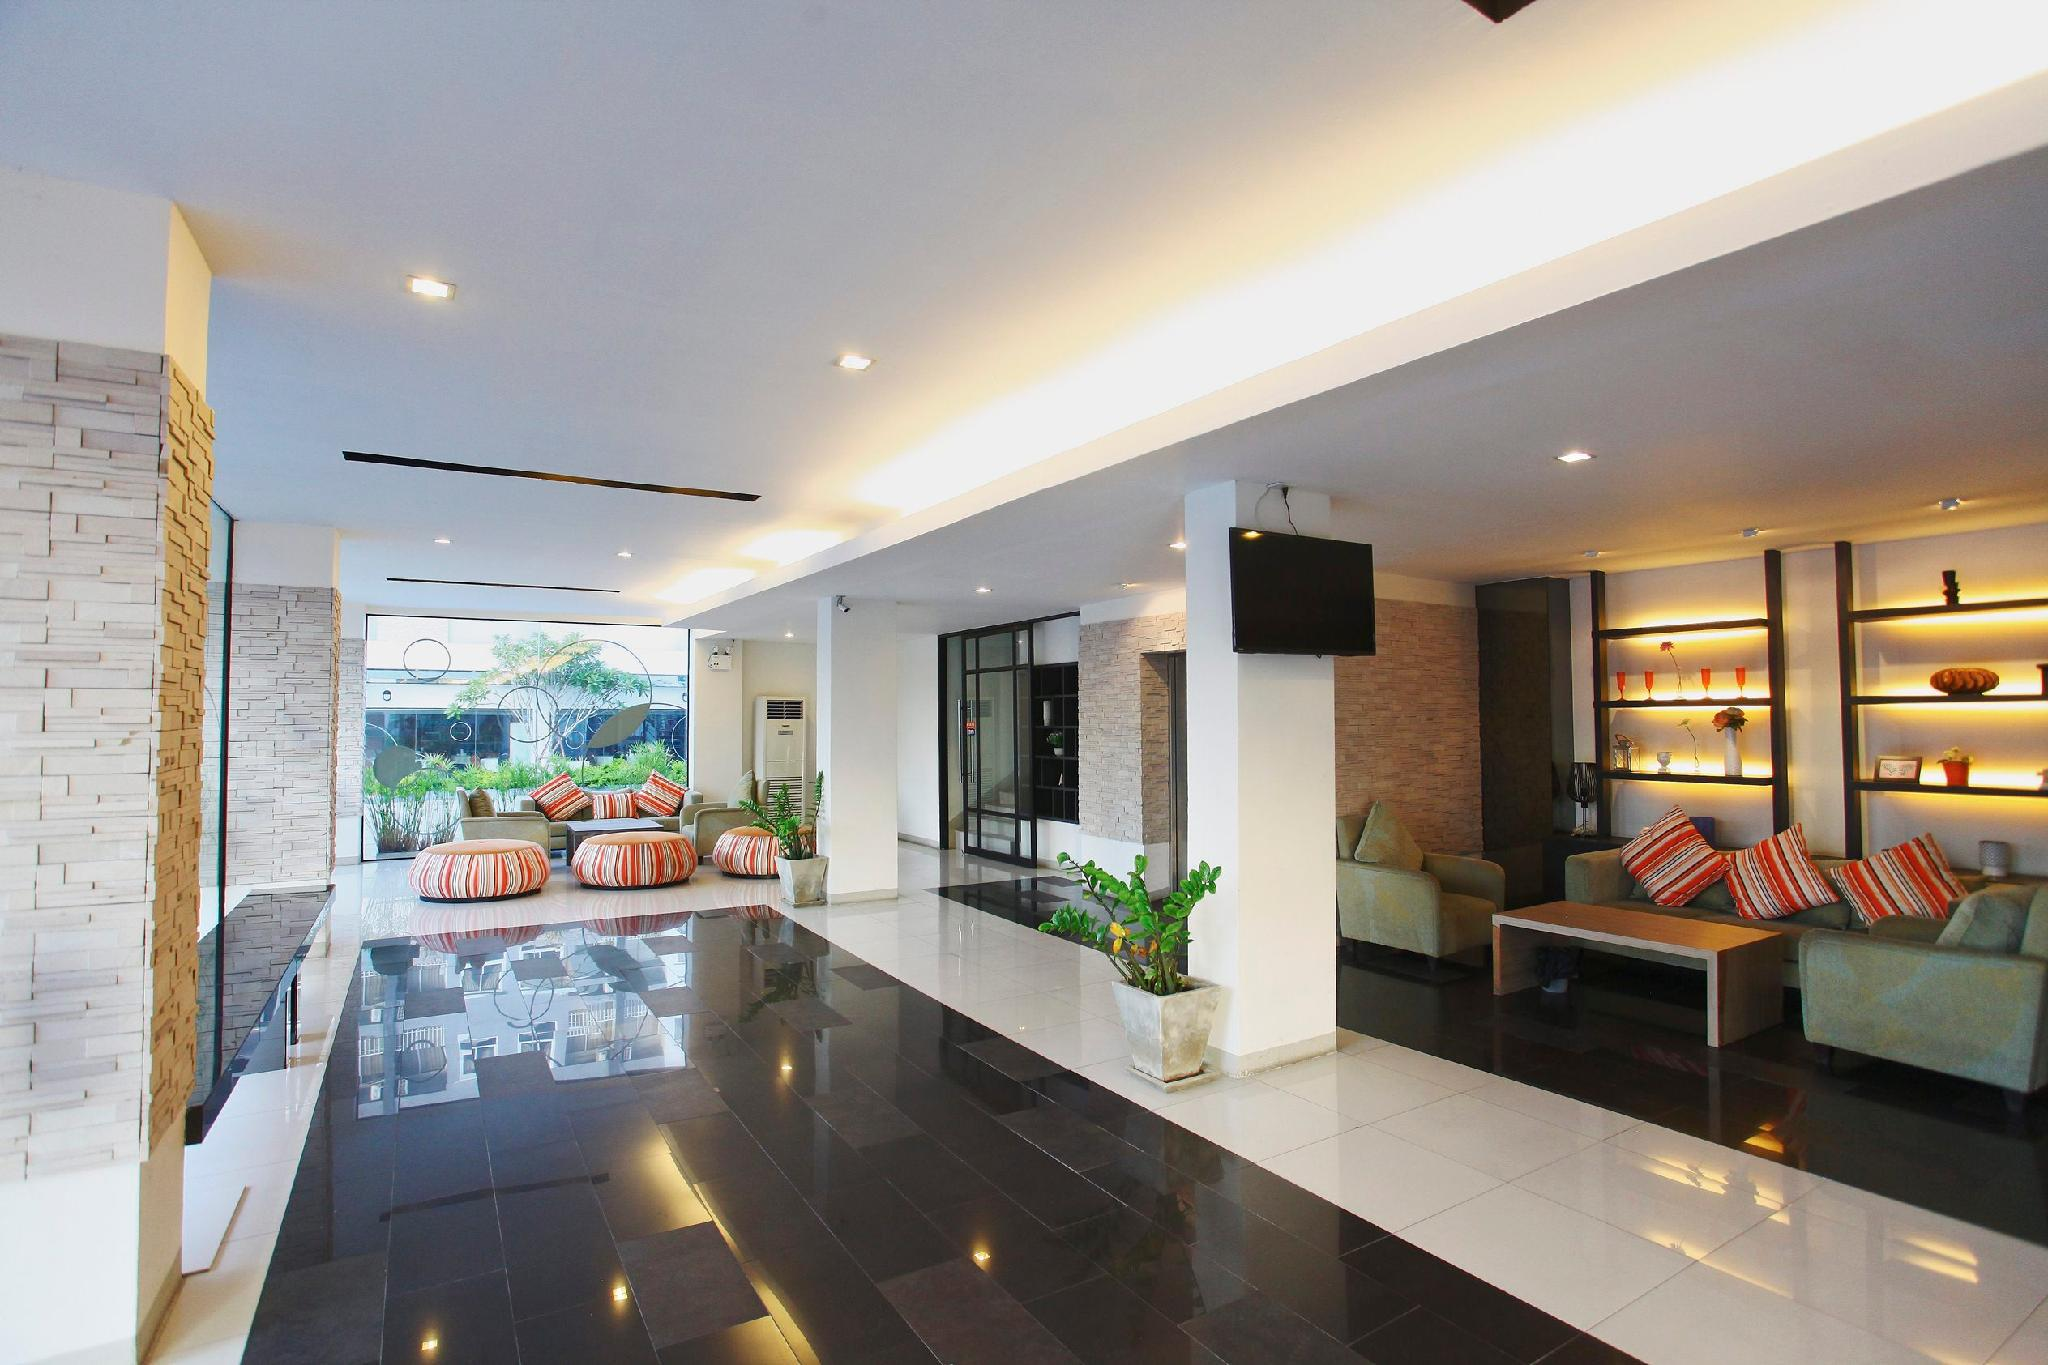 Lee Nova Hotel โรงแรมลี โนวา